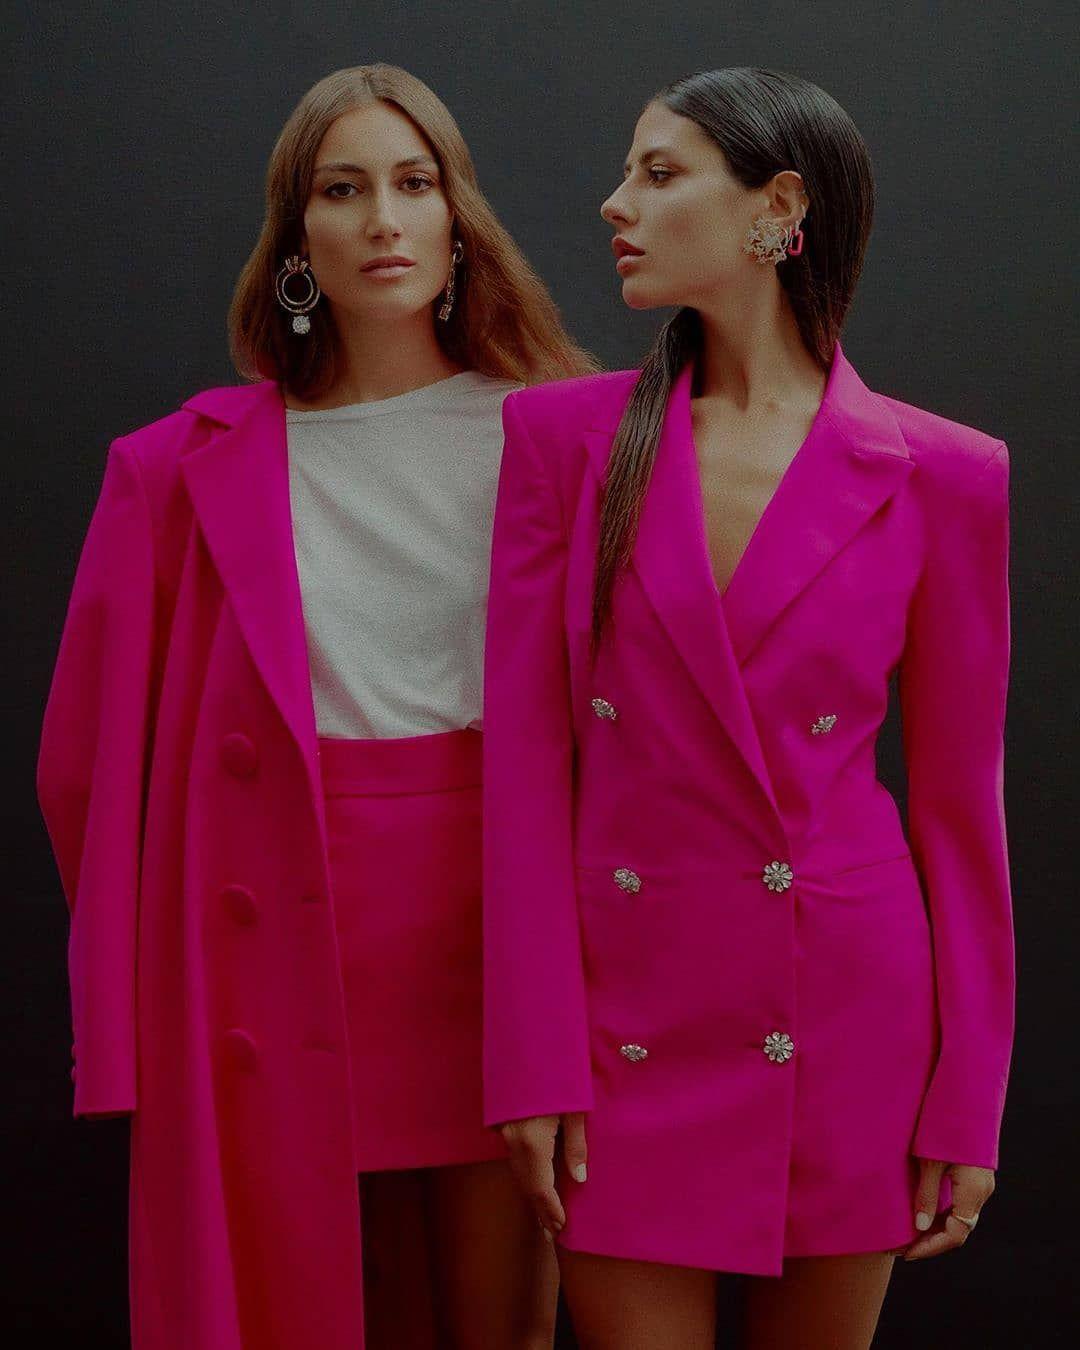 Raffyoo Podelilsya As Publikaciej V Instagram Gildaambrosio Giorgiatordini Raffyoo Podpishites Na Akkaunt Polzovat In 2020 Fashion Star Fashion Street Style